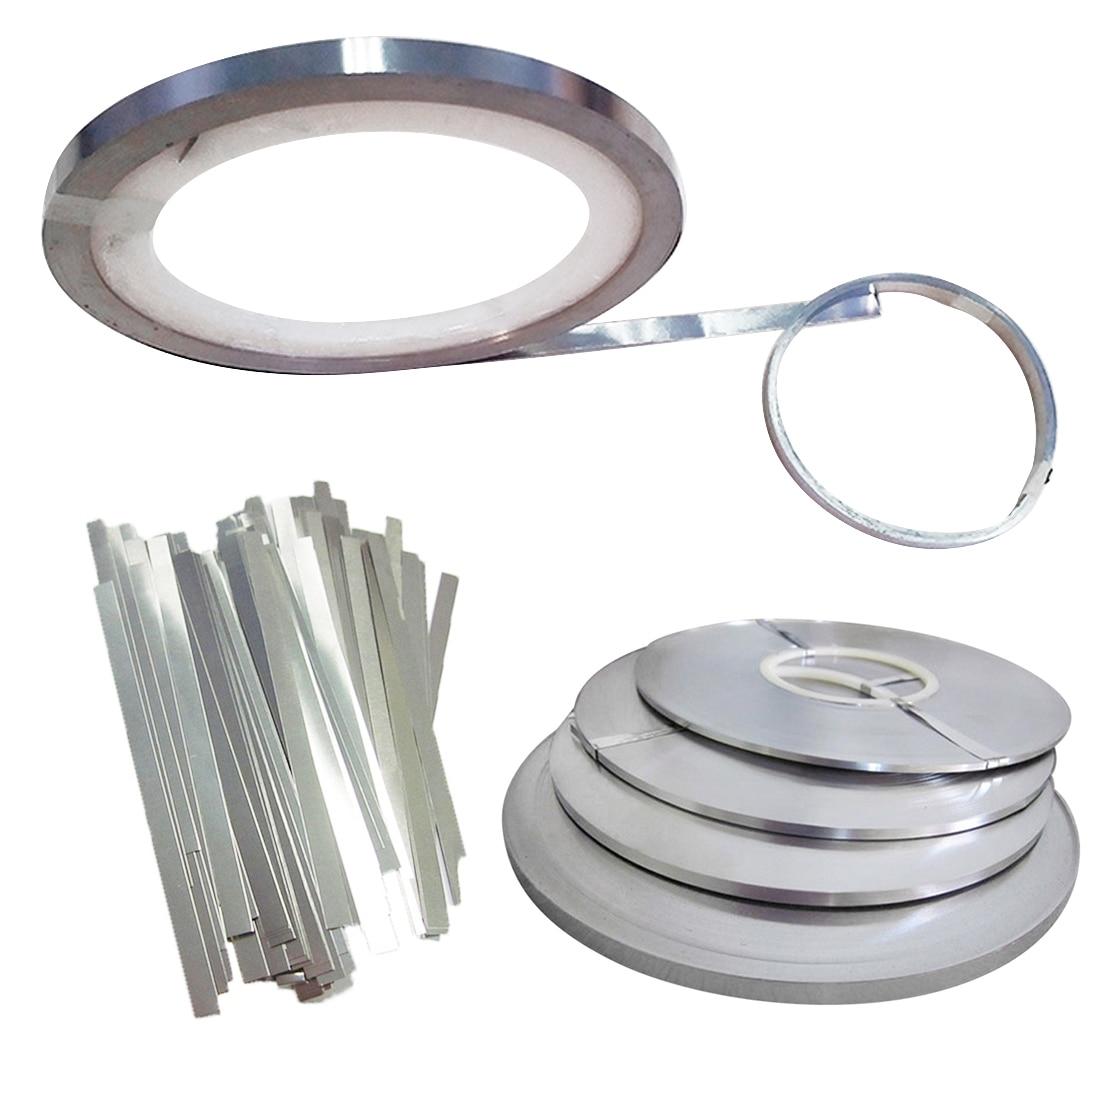 Hot Sale 0.1mm*5mm * 2m  Nickel Plated Strip Tape For Laptop  Battery Spot Welding Compatible Spot Welder Machine